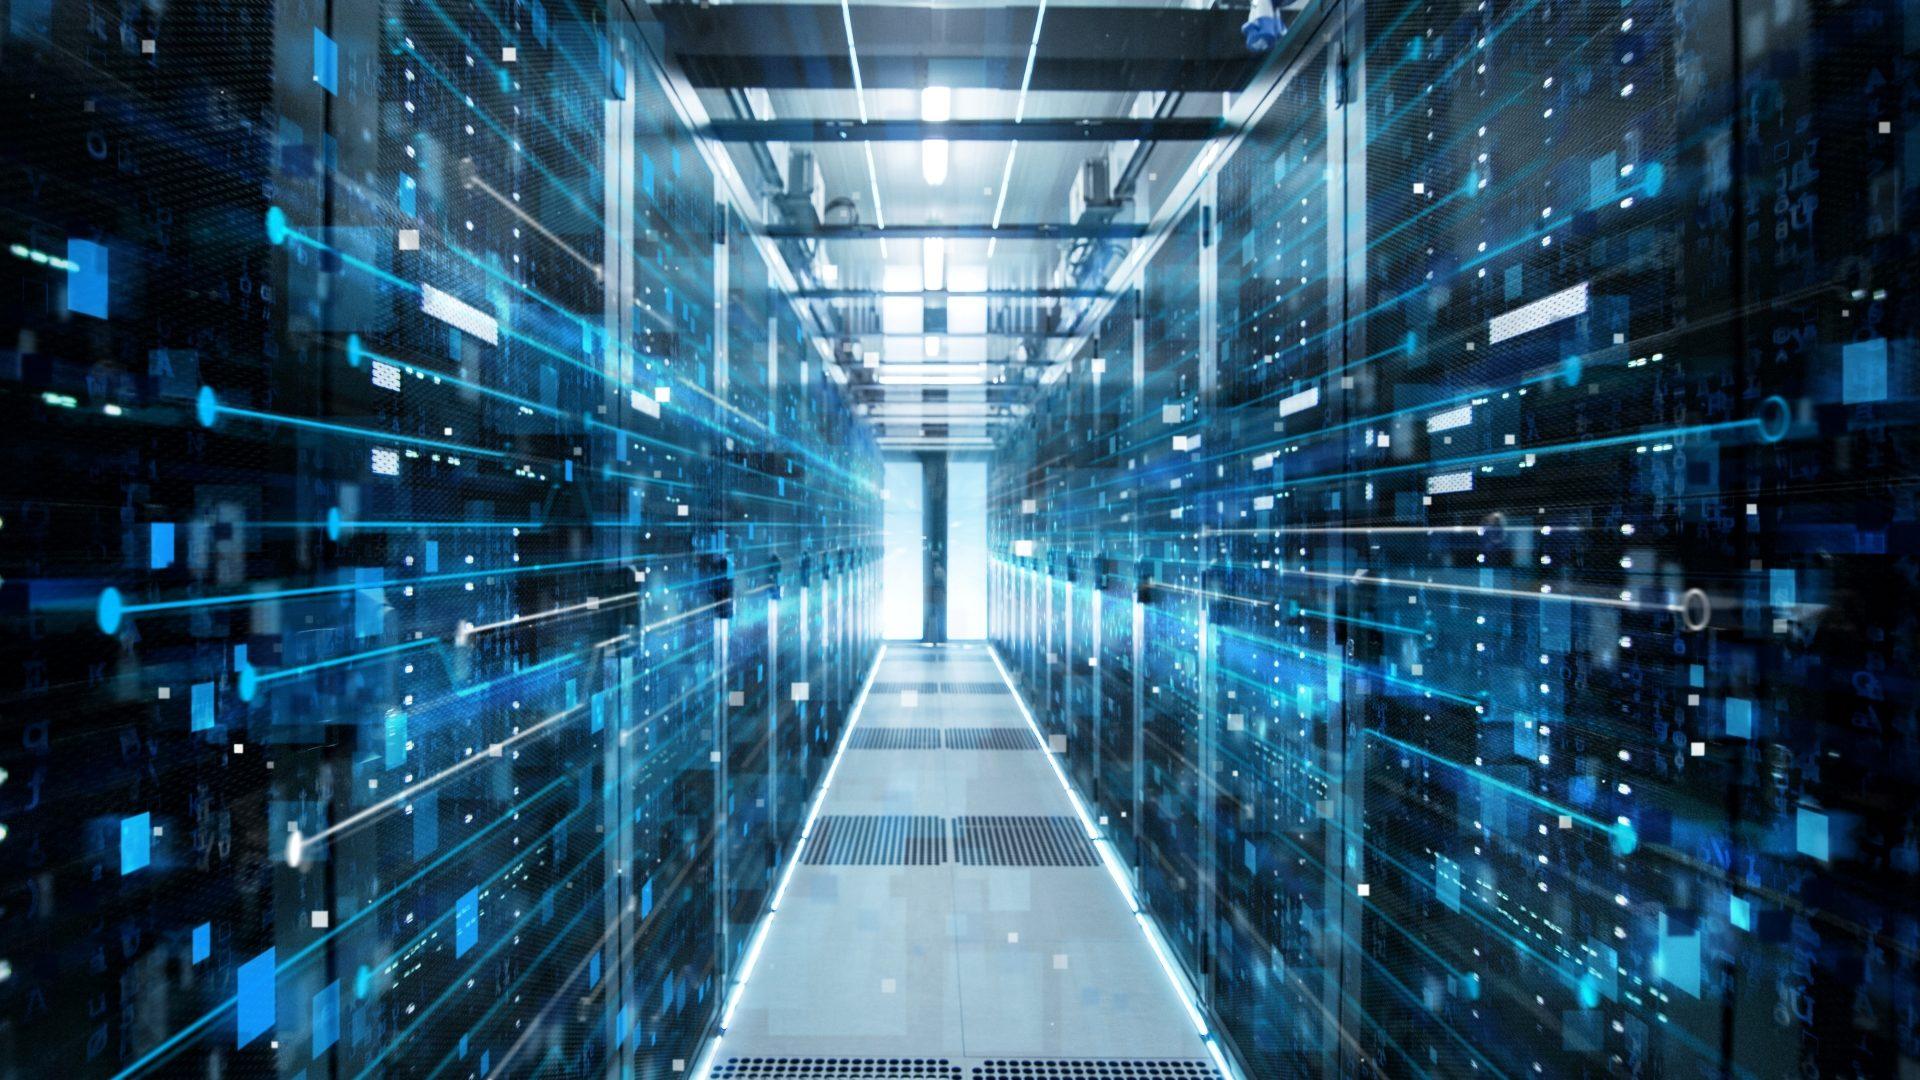 Image of a cloud data center